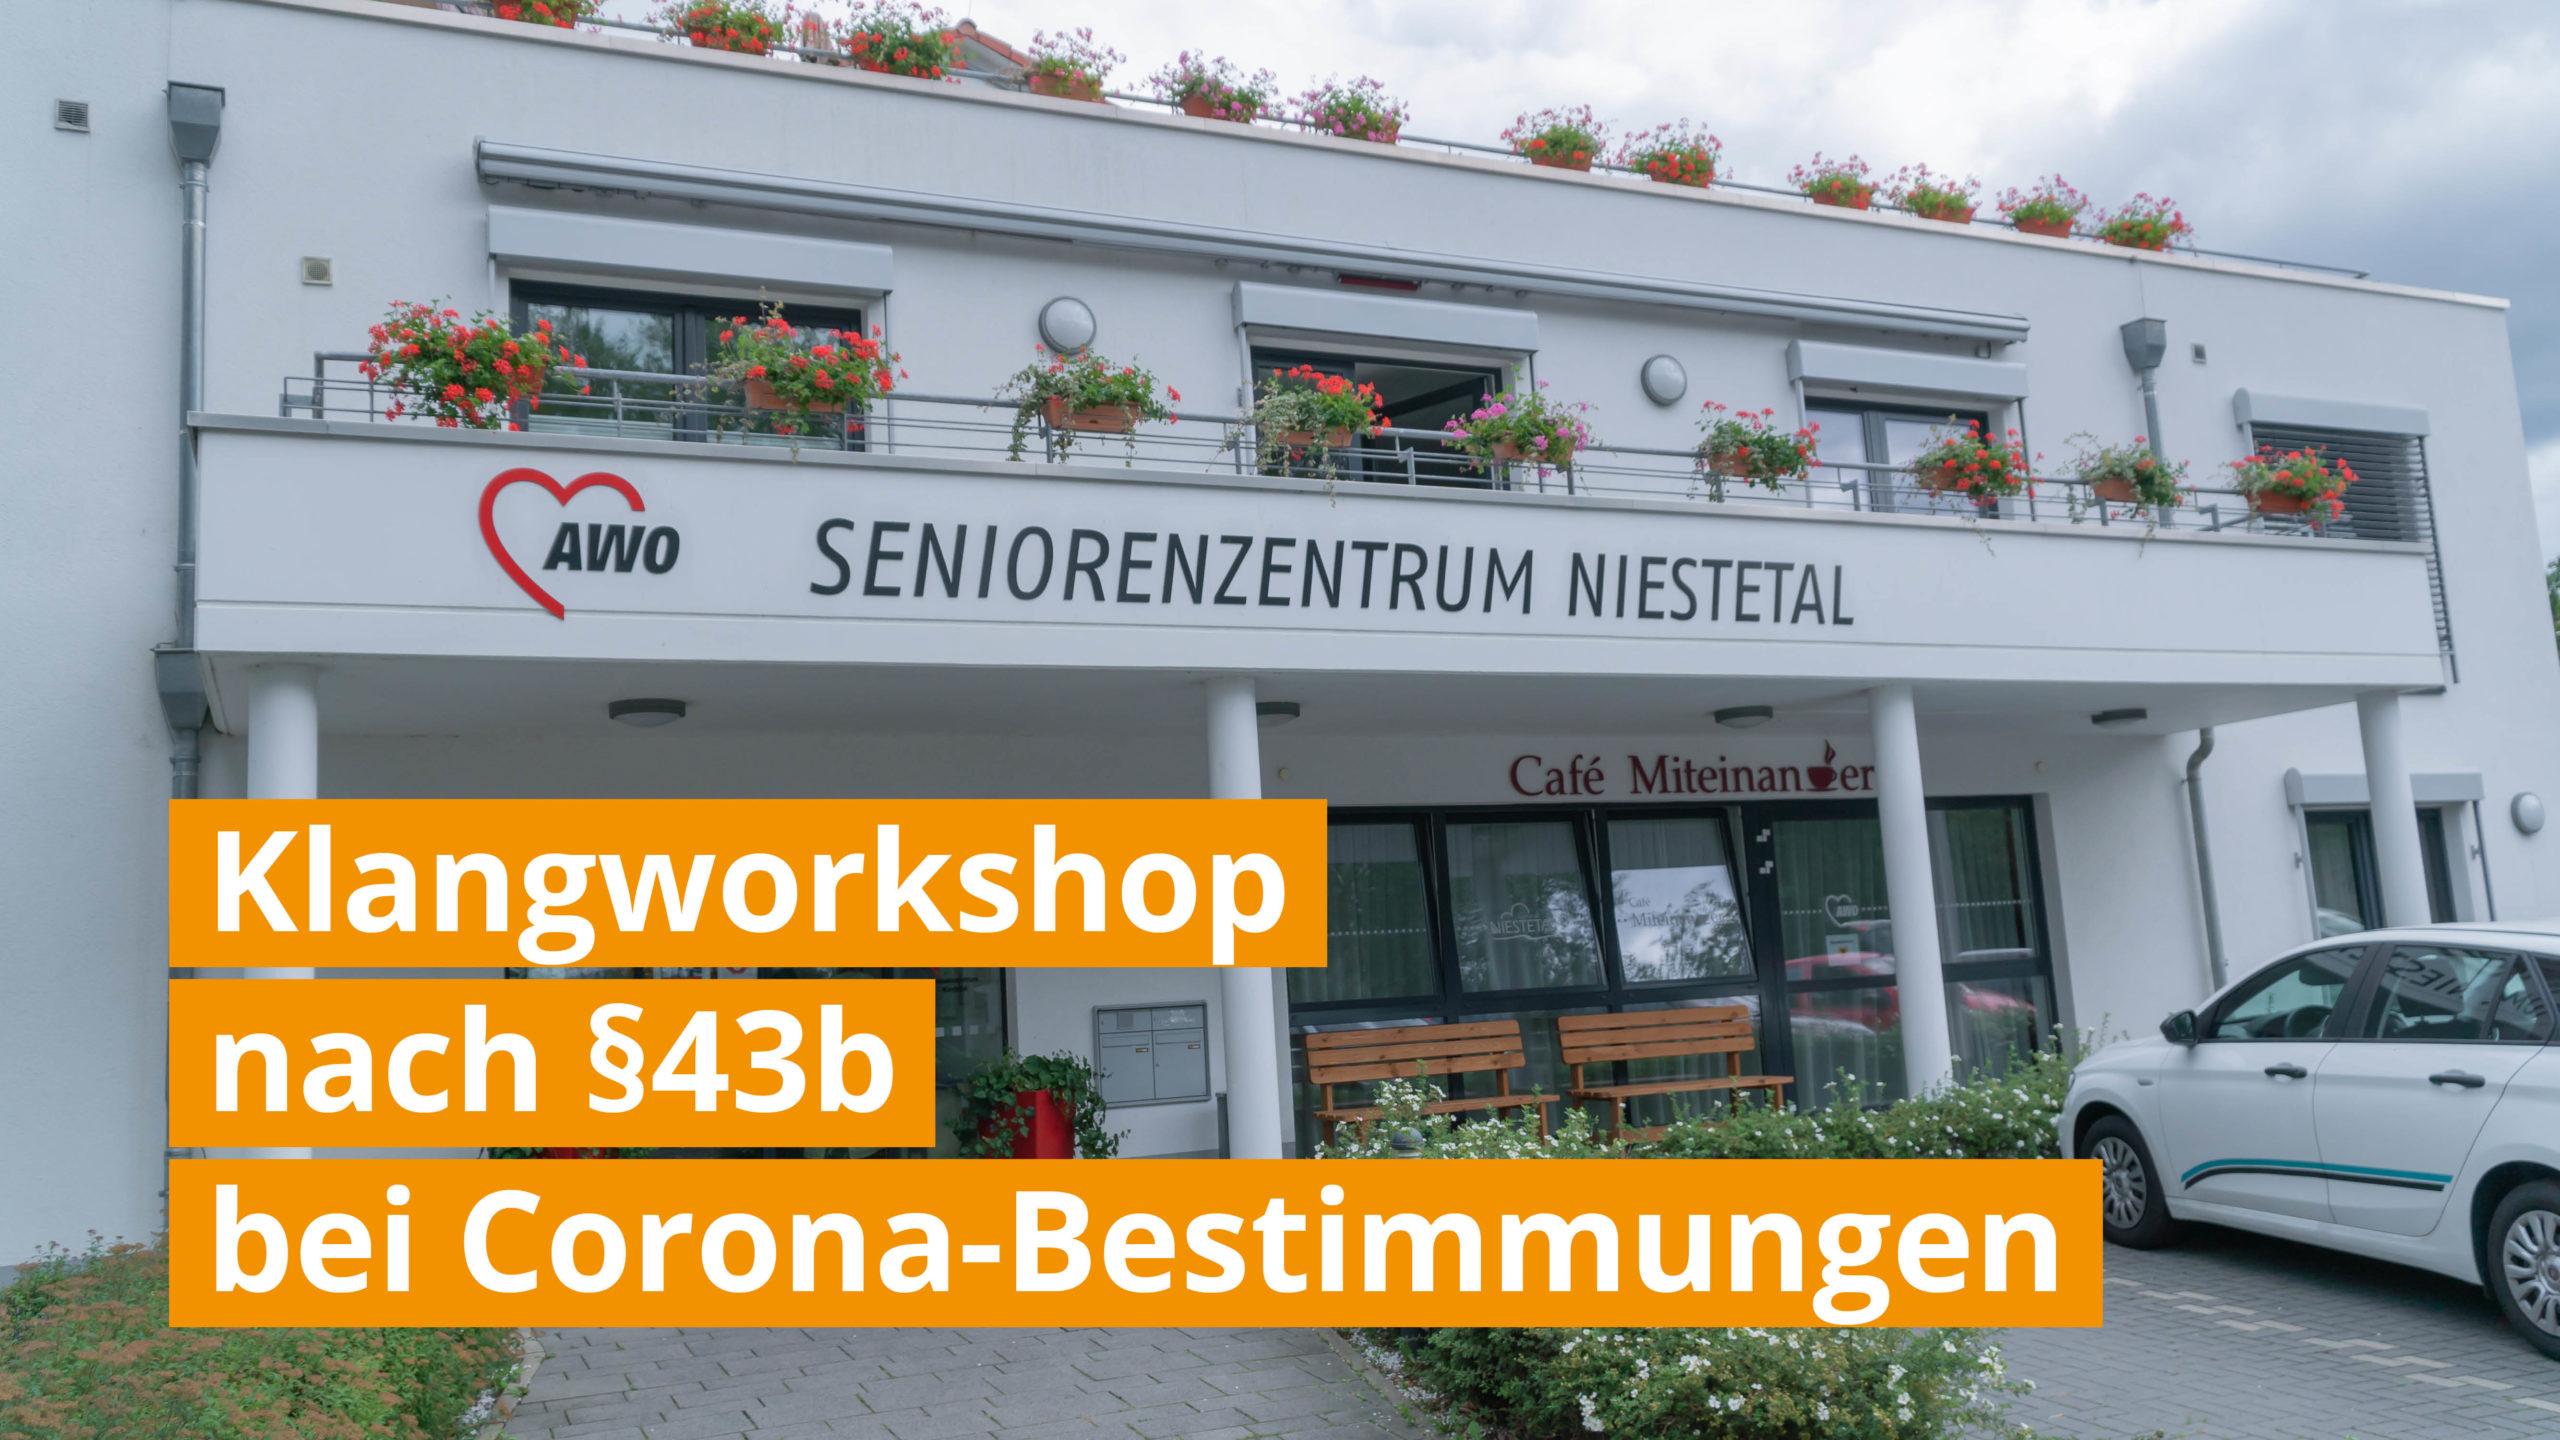 Thumbnail Wir Sind Altenpflege Klangworkshop Niestetal bei Corona-Bestimmungen